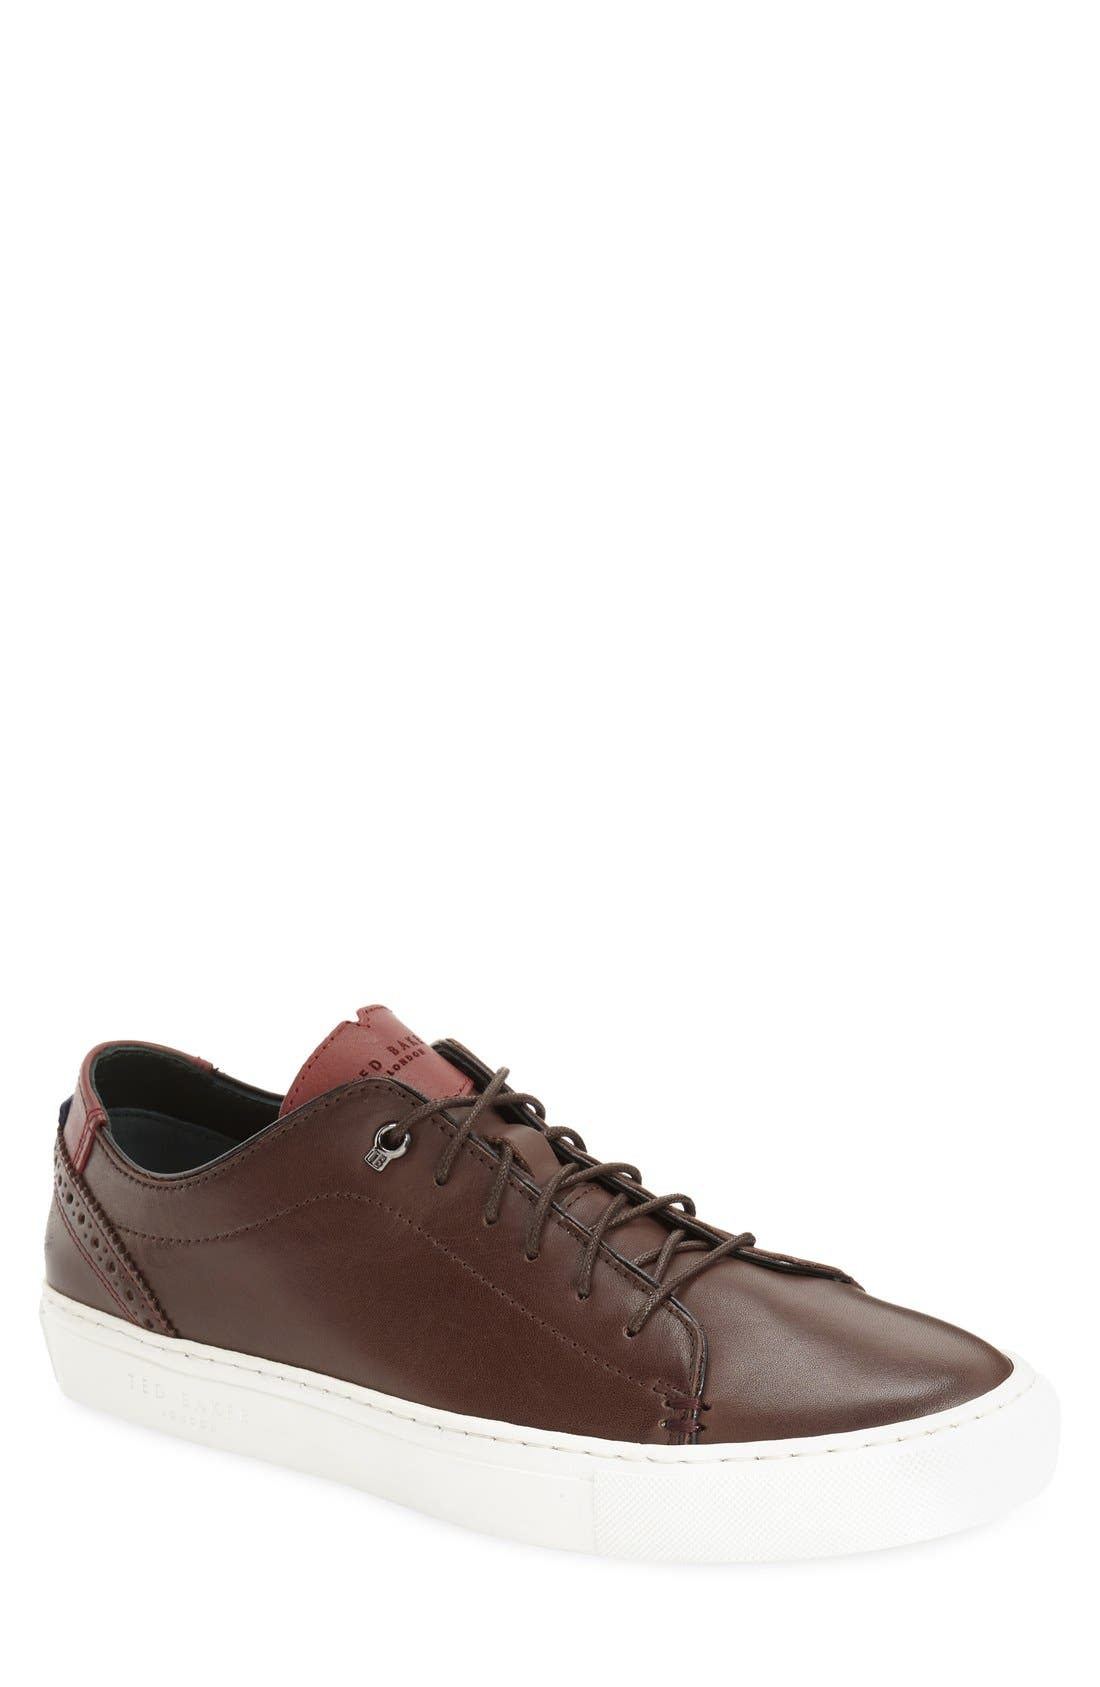 'Kiing Classic' Sneaker,                             Main thumbnail 6, color,